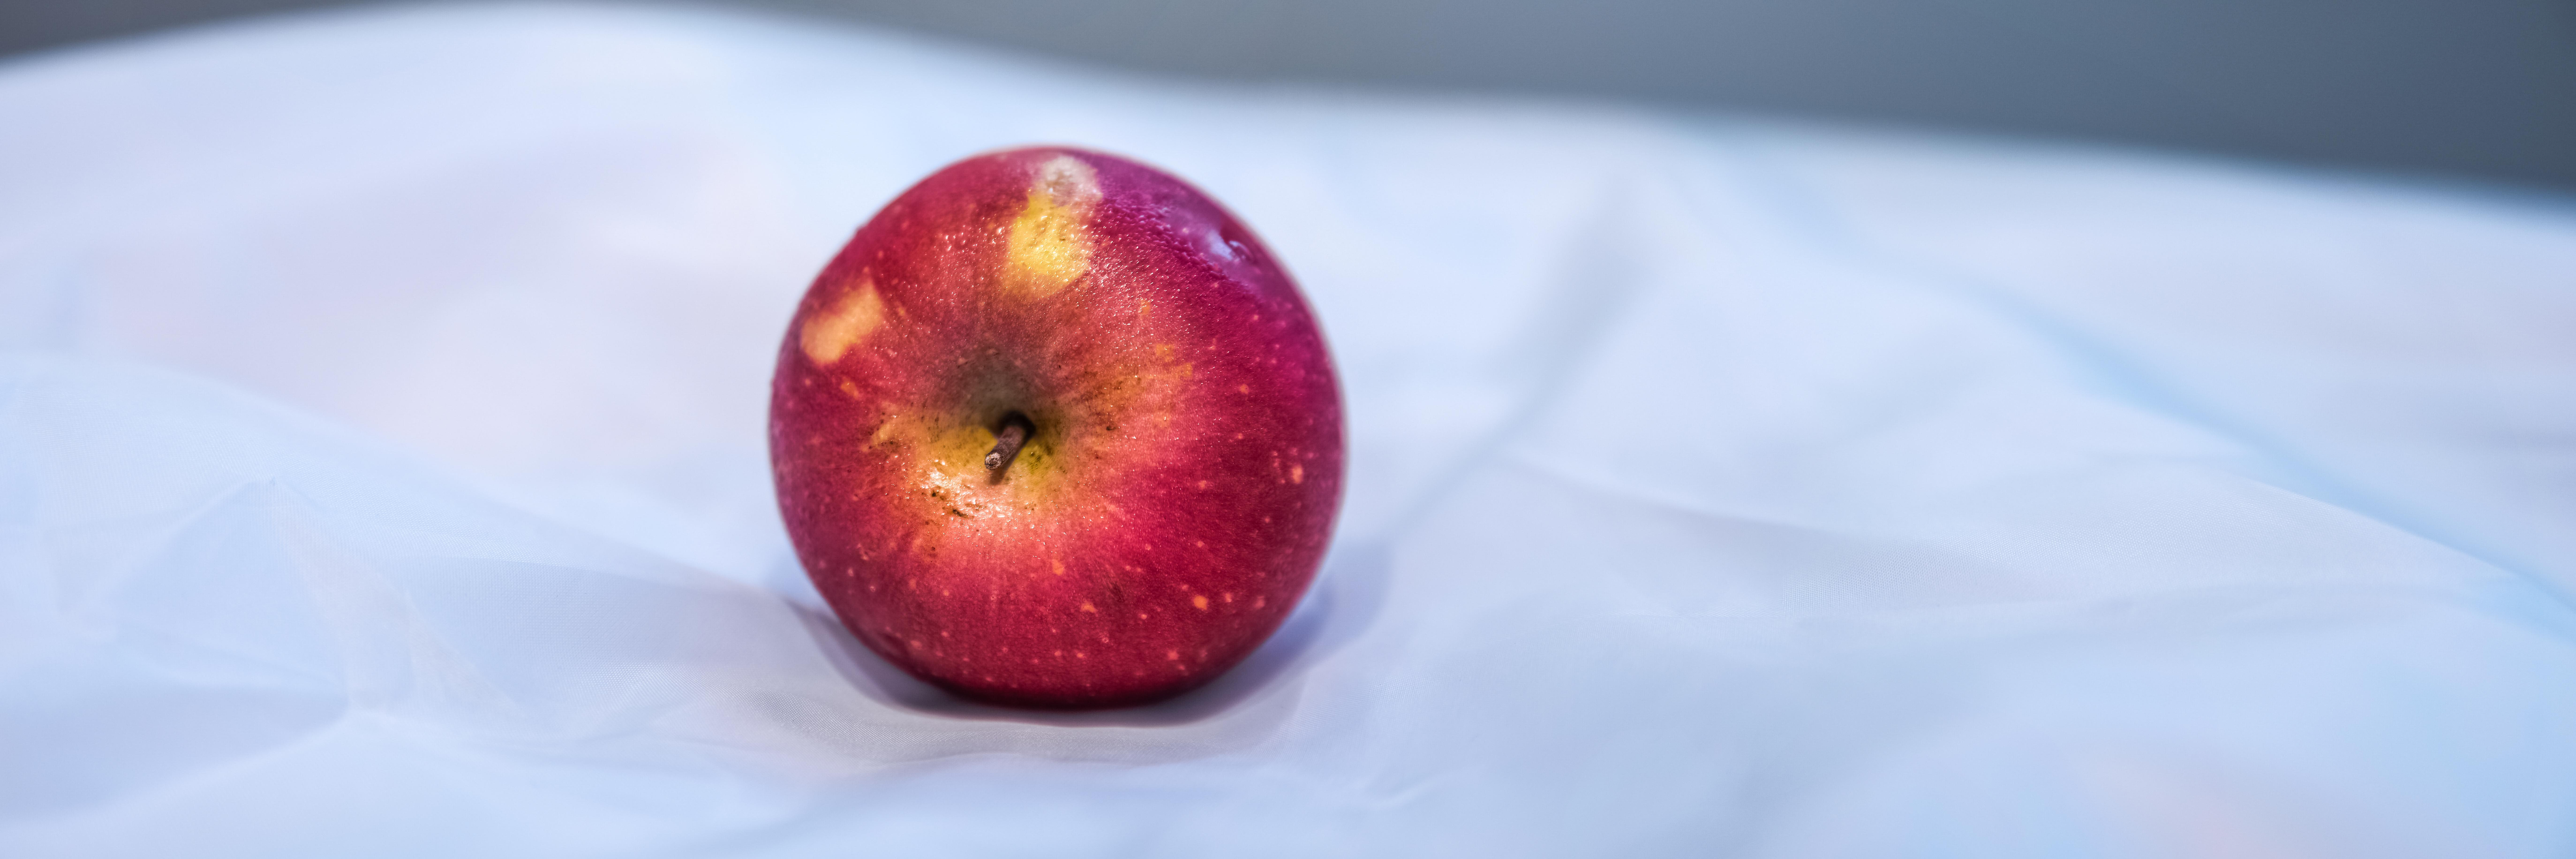 Apple fruit images download - Free Download